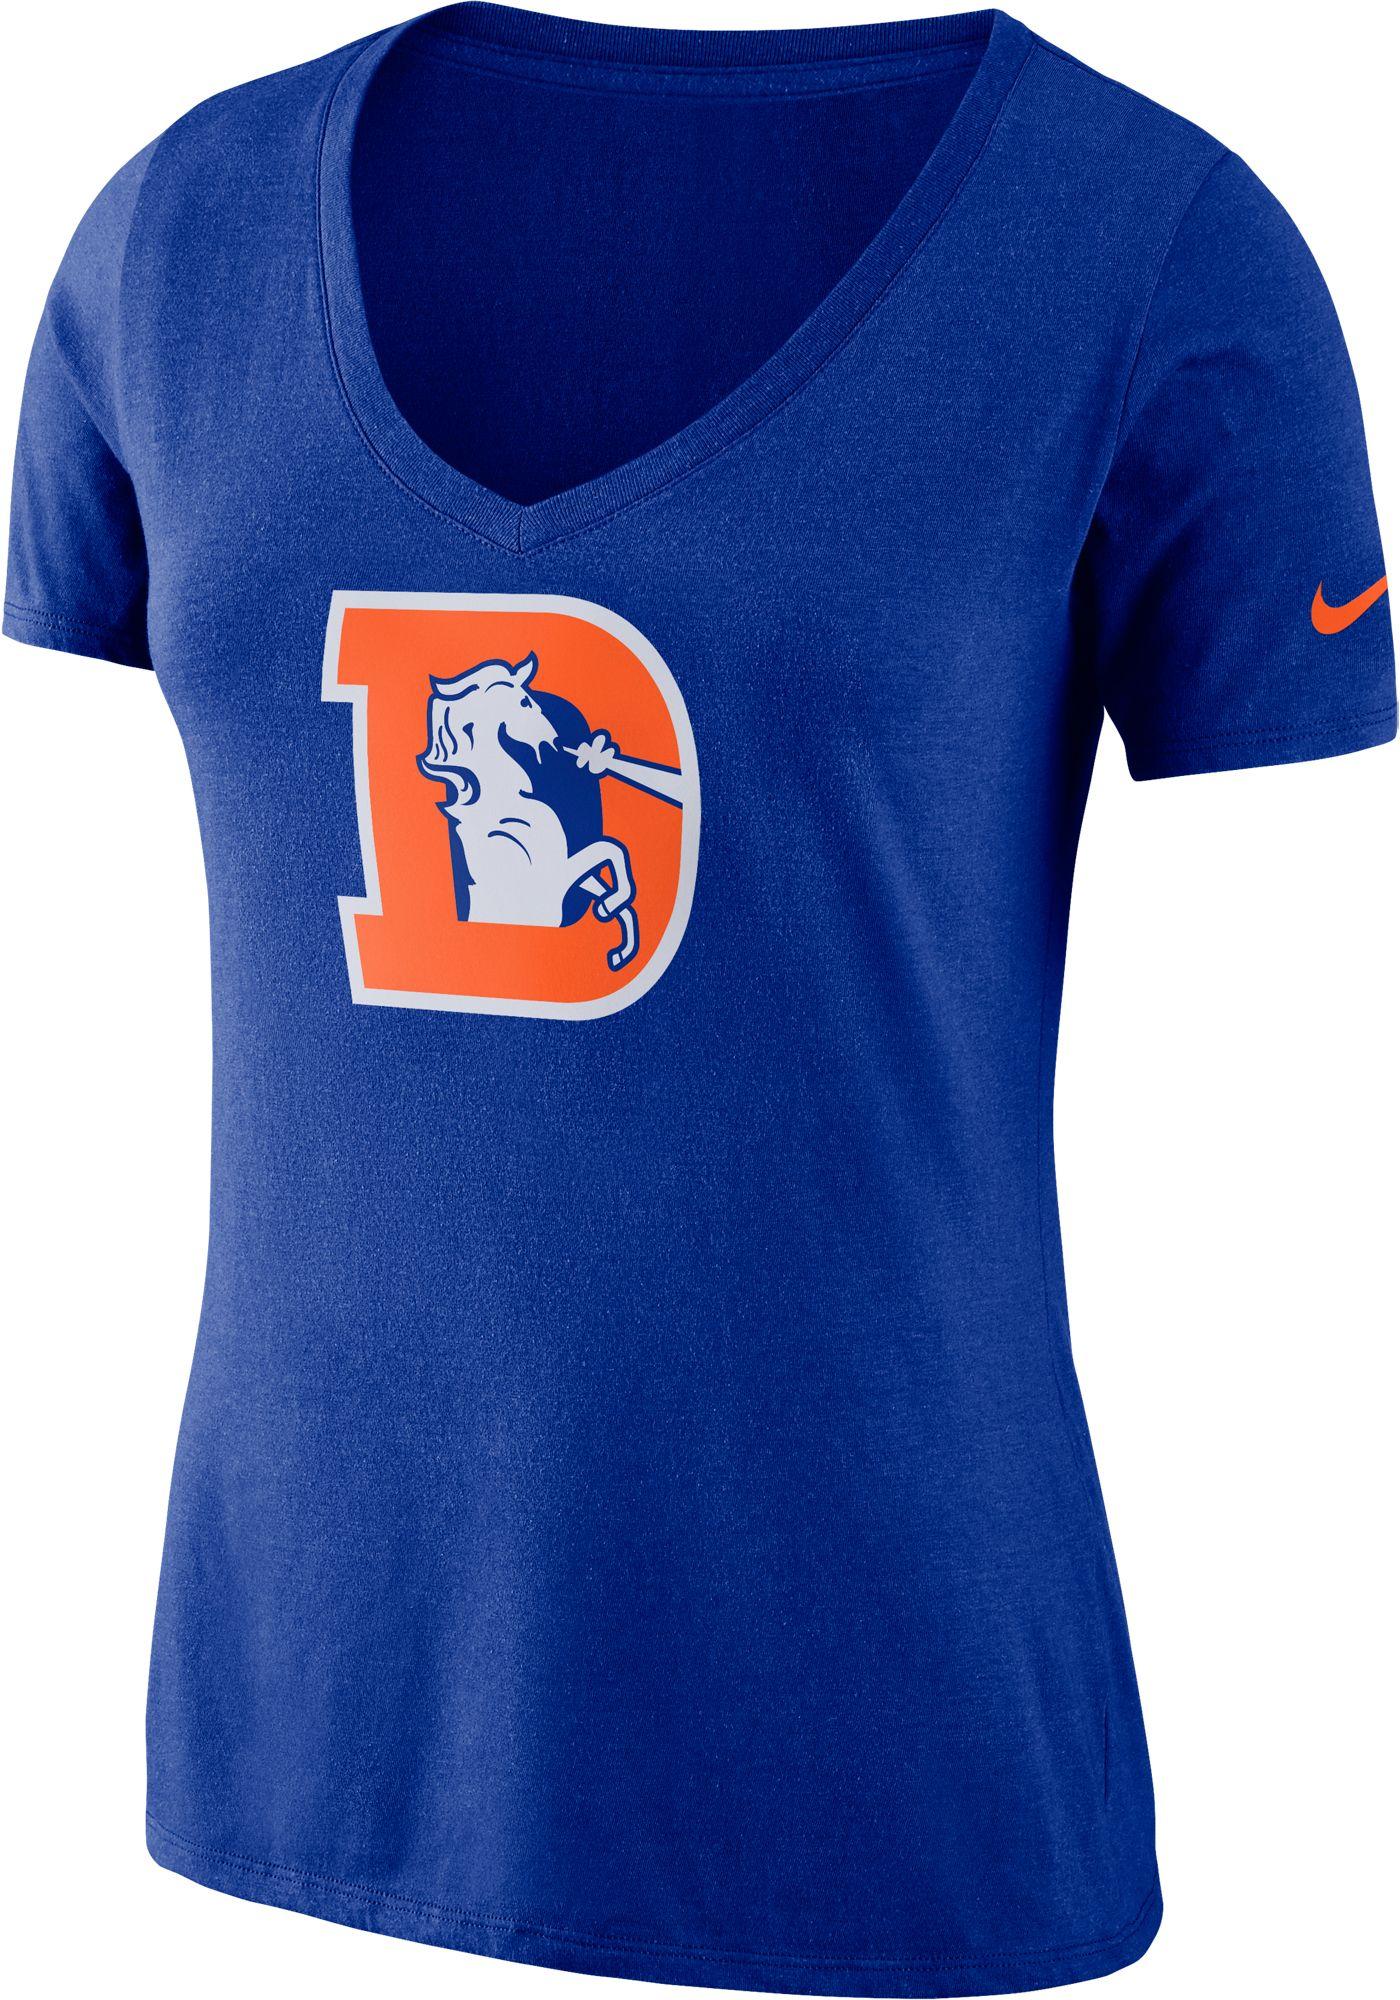 Nike Women's Denver Broncos Tri-Blend Historic Royal T-Shirt